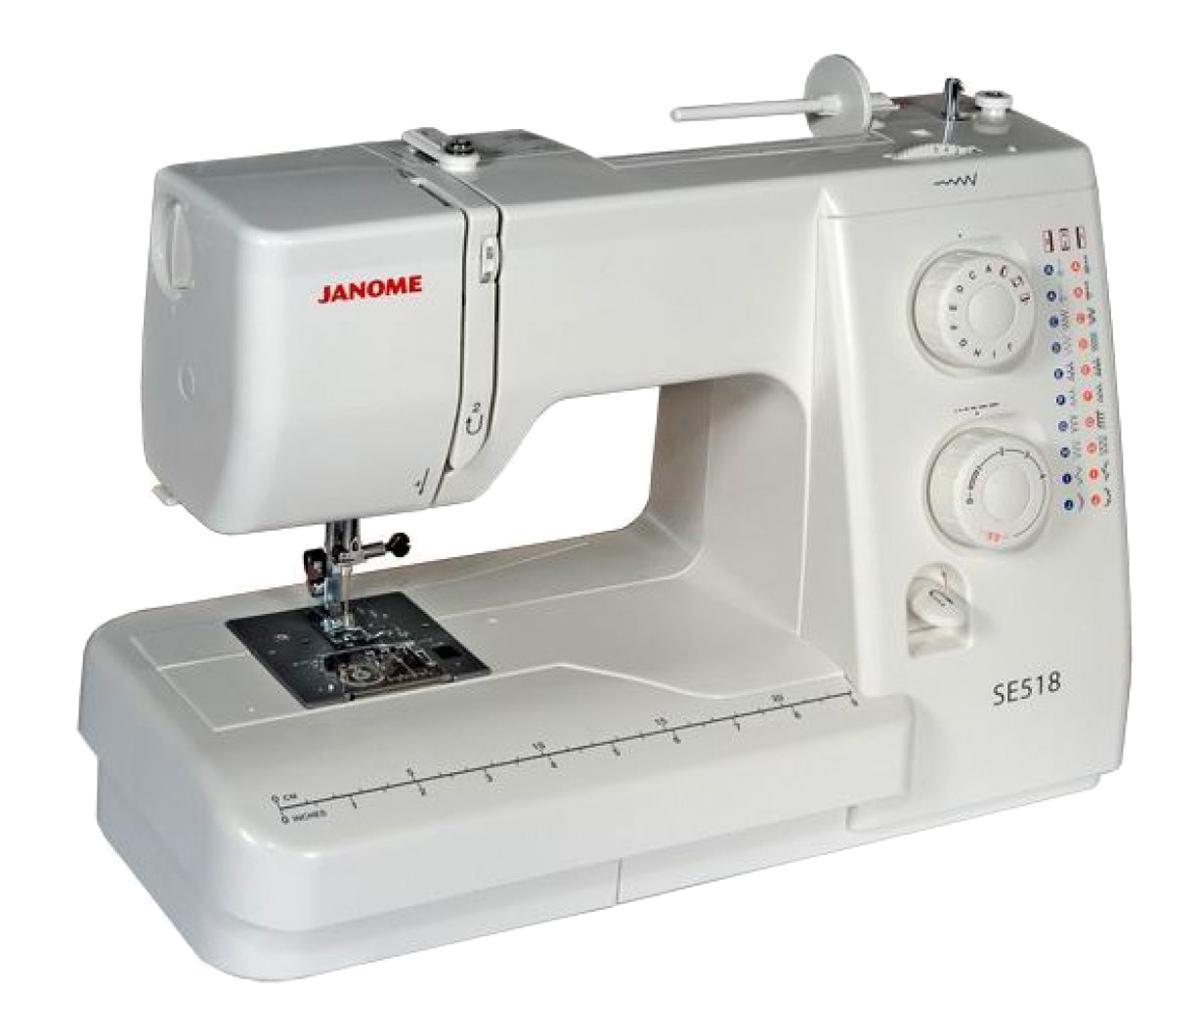 Janome SE 518 швейная машина